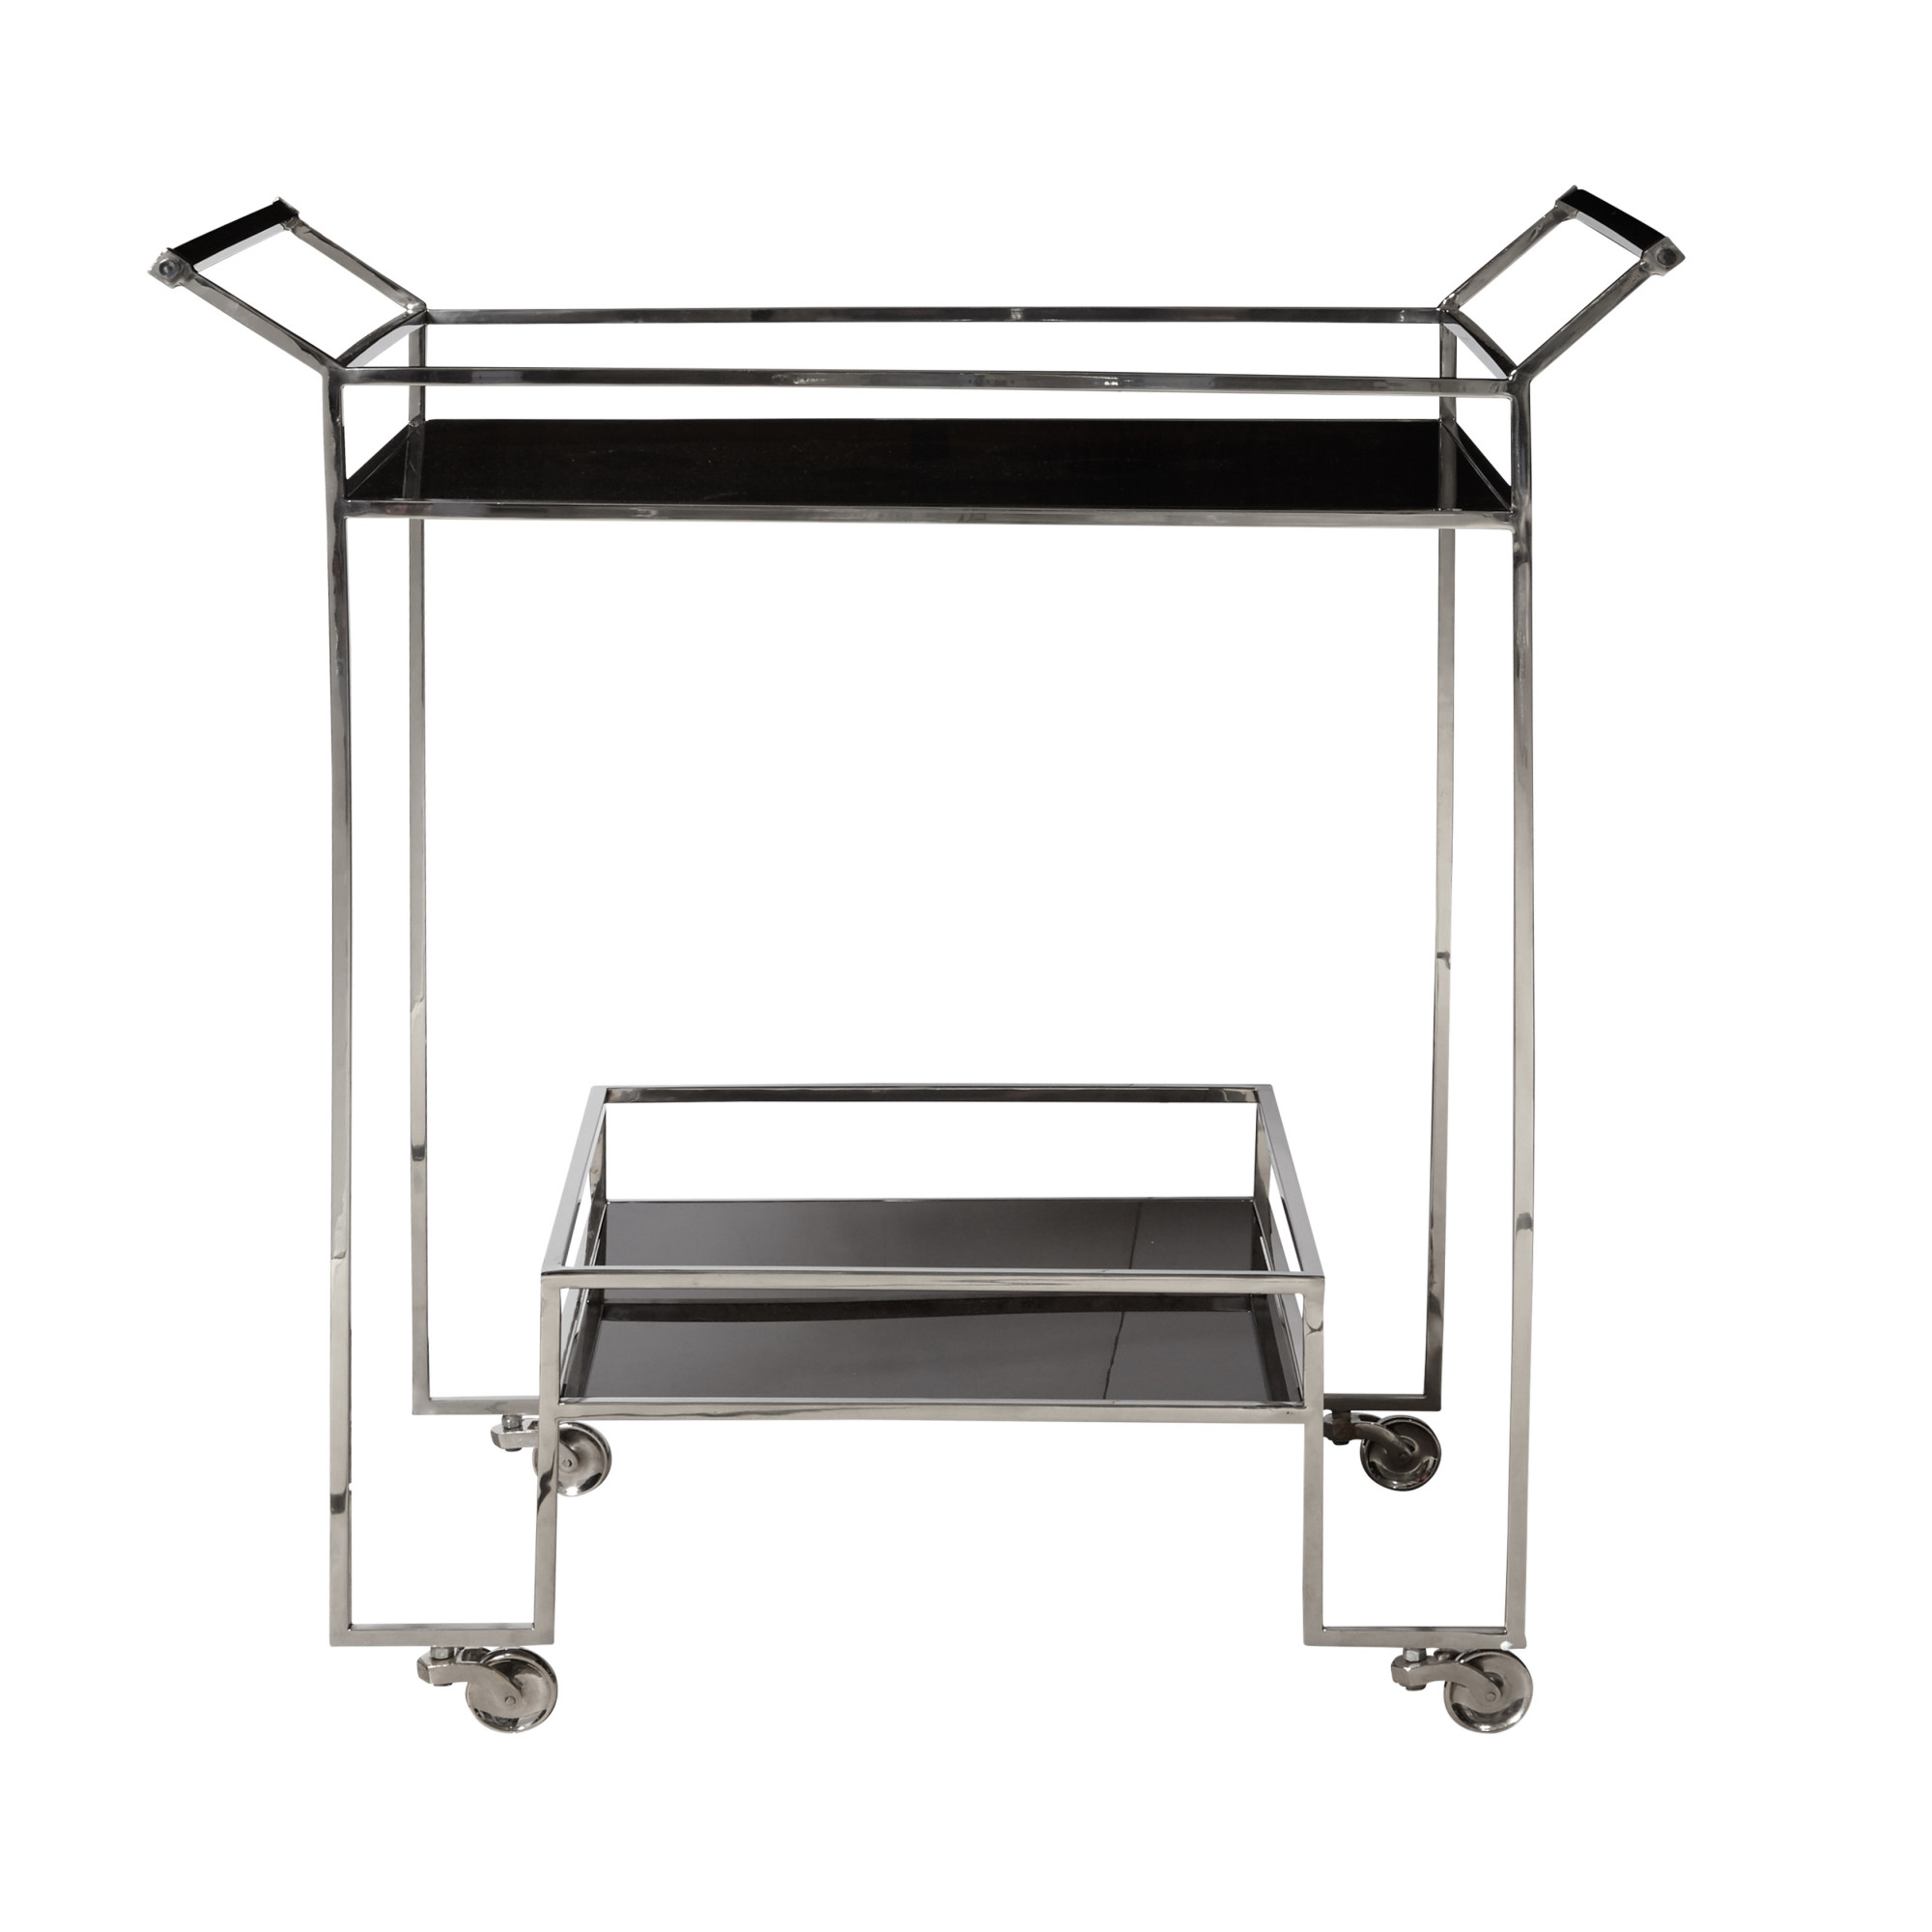 "Delacora HM-P020422 Naya 19-1/2"" Wide Steel Bar Cart with Acrylic Shelves"